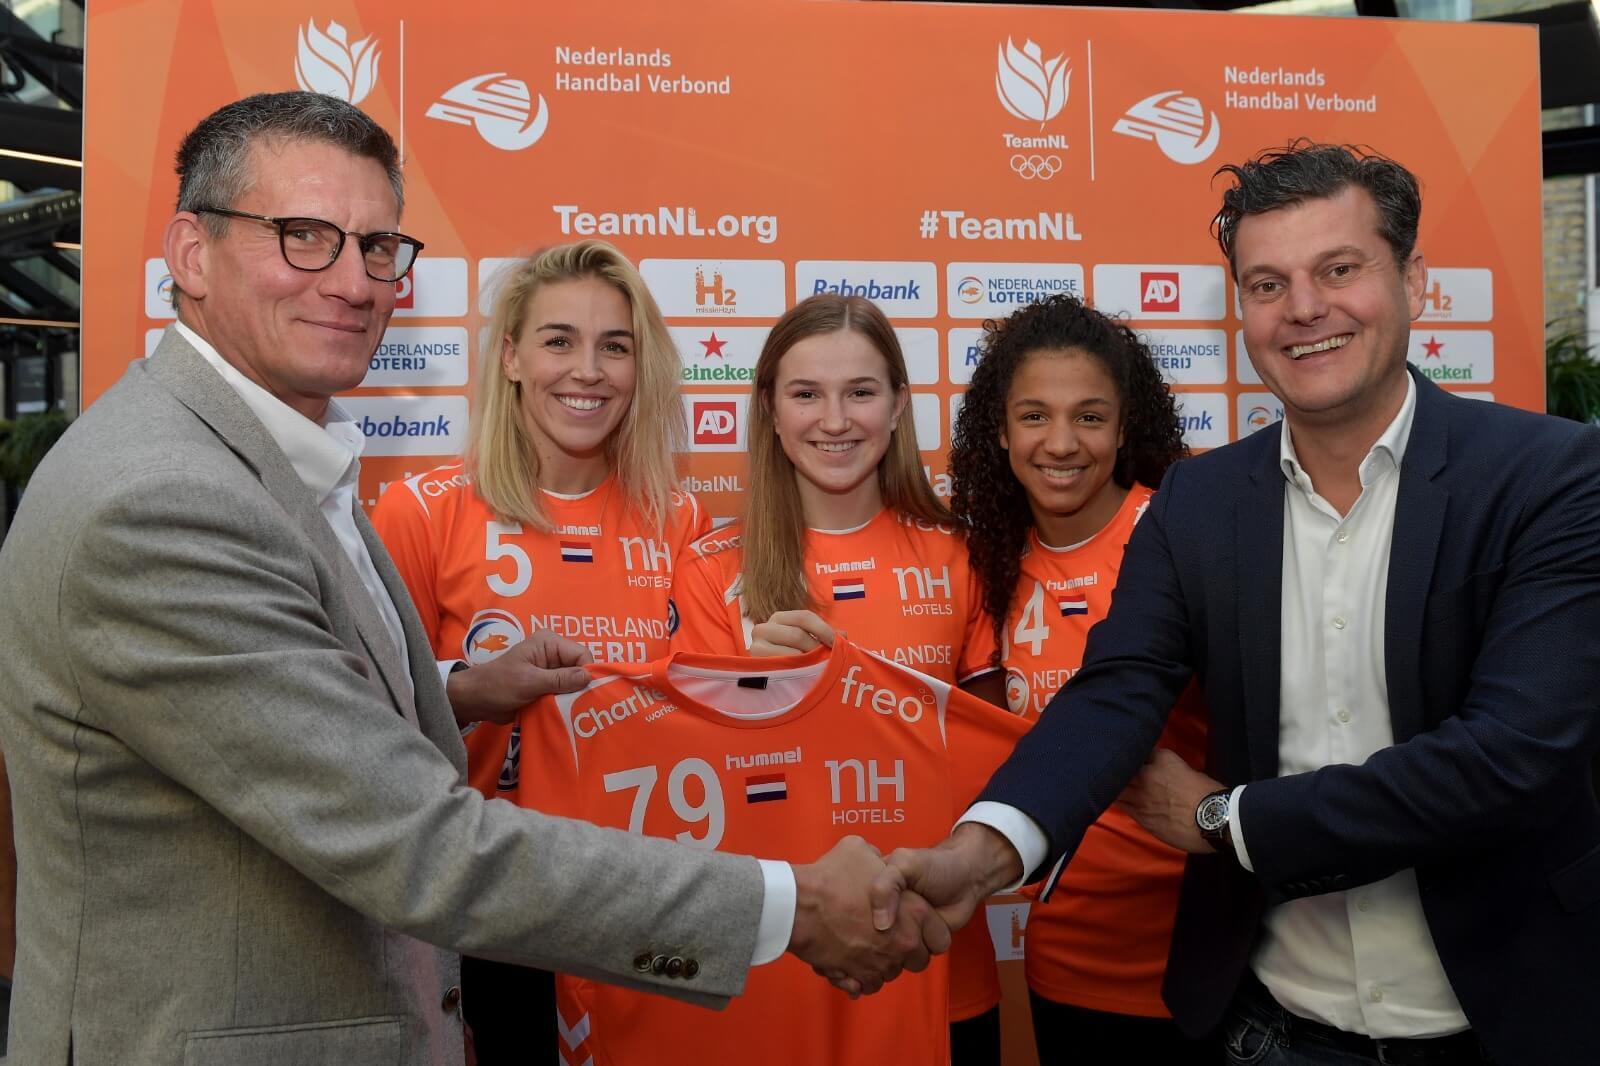 Freo Nieuwe Shirtsponsor Van TeamNL Handbaldames